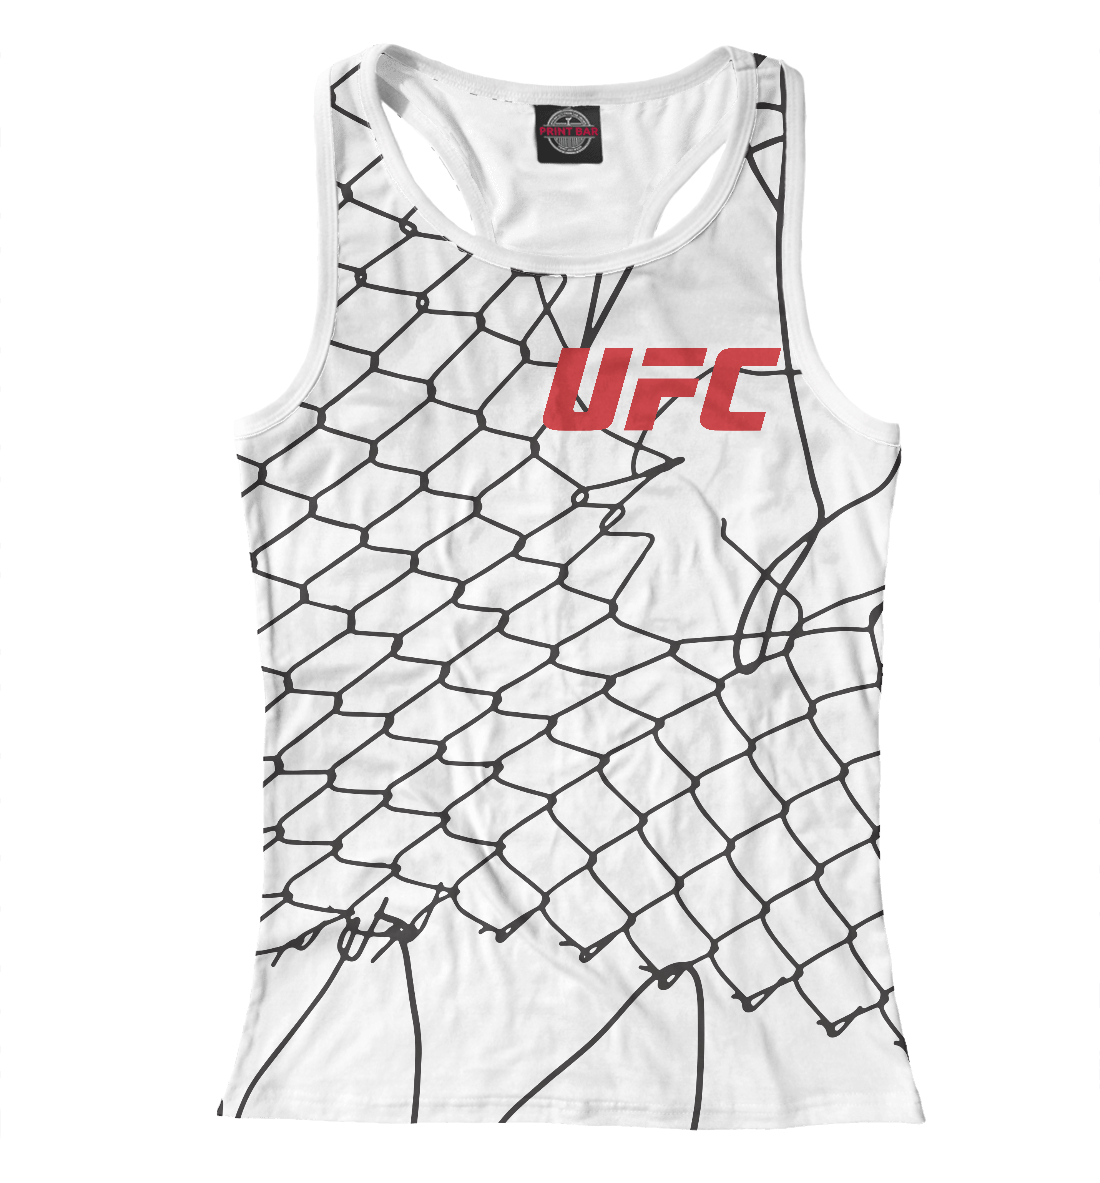 Купить UFC Клетка, Printbar, Майки борцовки, MNU-518706-mayb-1